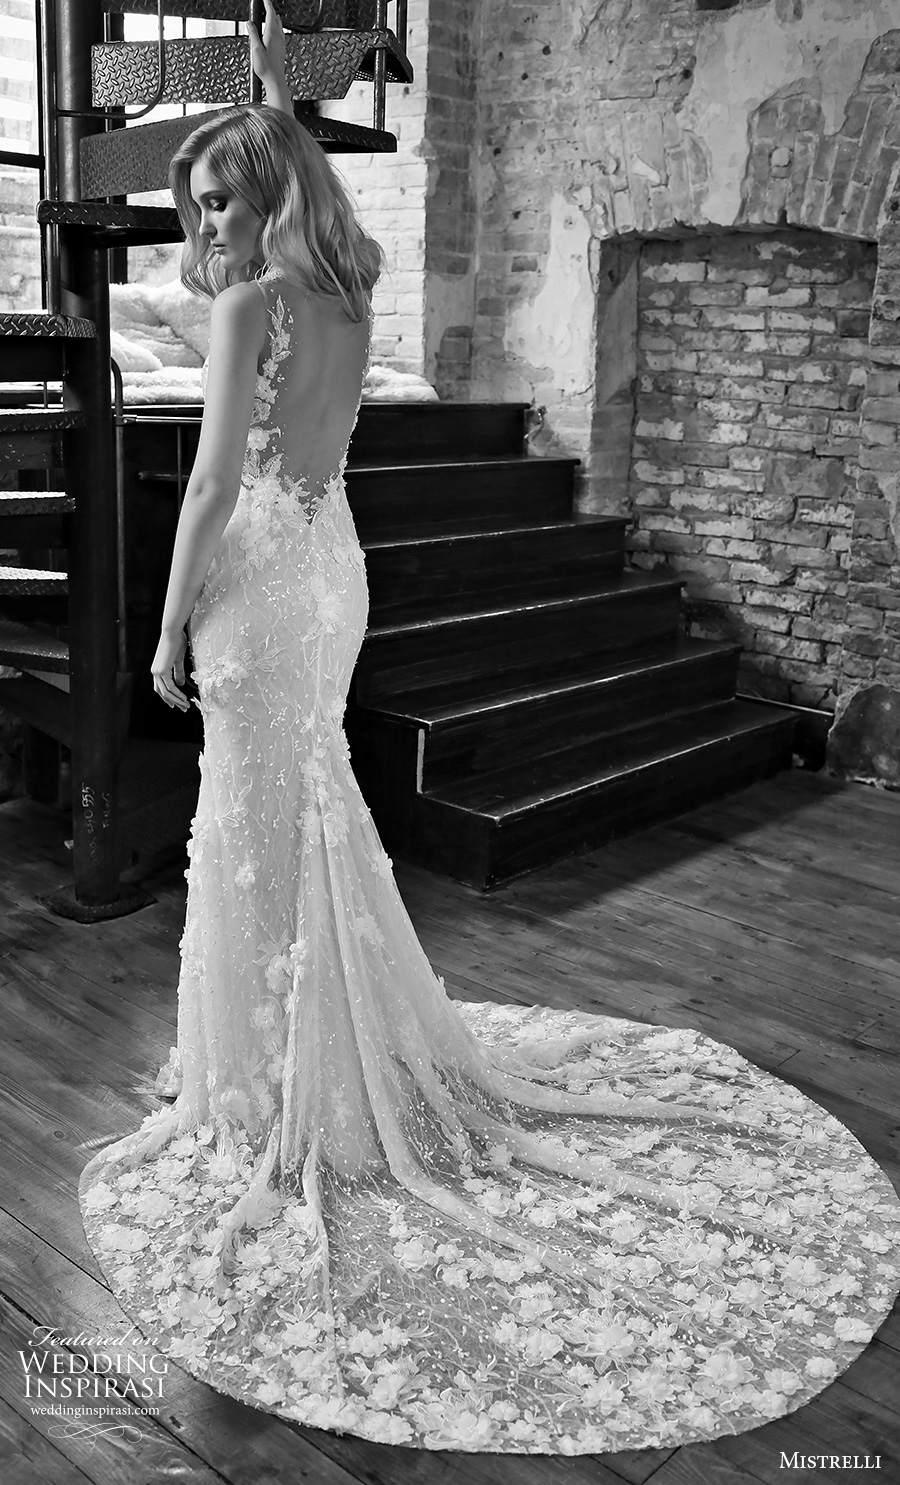 mistrelli 2021 royal drama bridal sleeveless thin strap deep plunging v neck full embellishment glamorous elegant sheath wedding dress backless low back medium train (4) bv